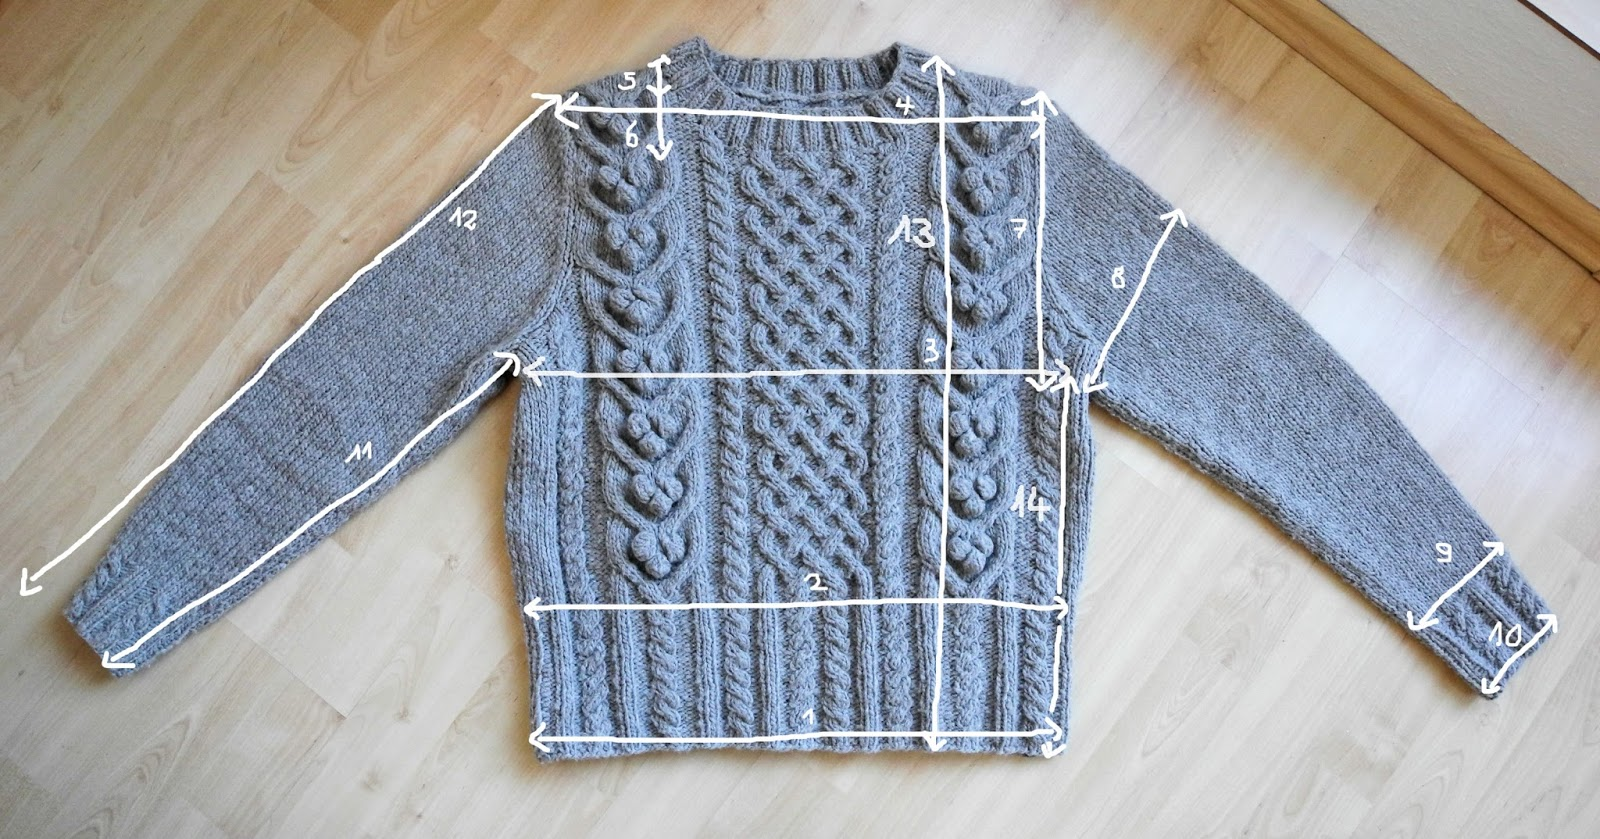 fadengold land girls moving cable sweater ist fertig. Black Bedroom Furniture Sets. Home Design Ideas